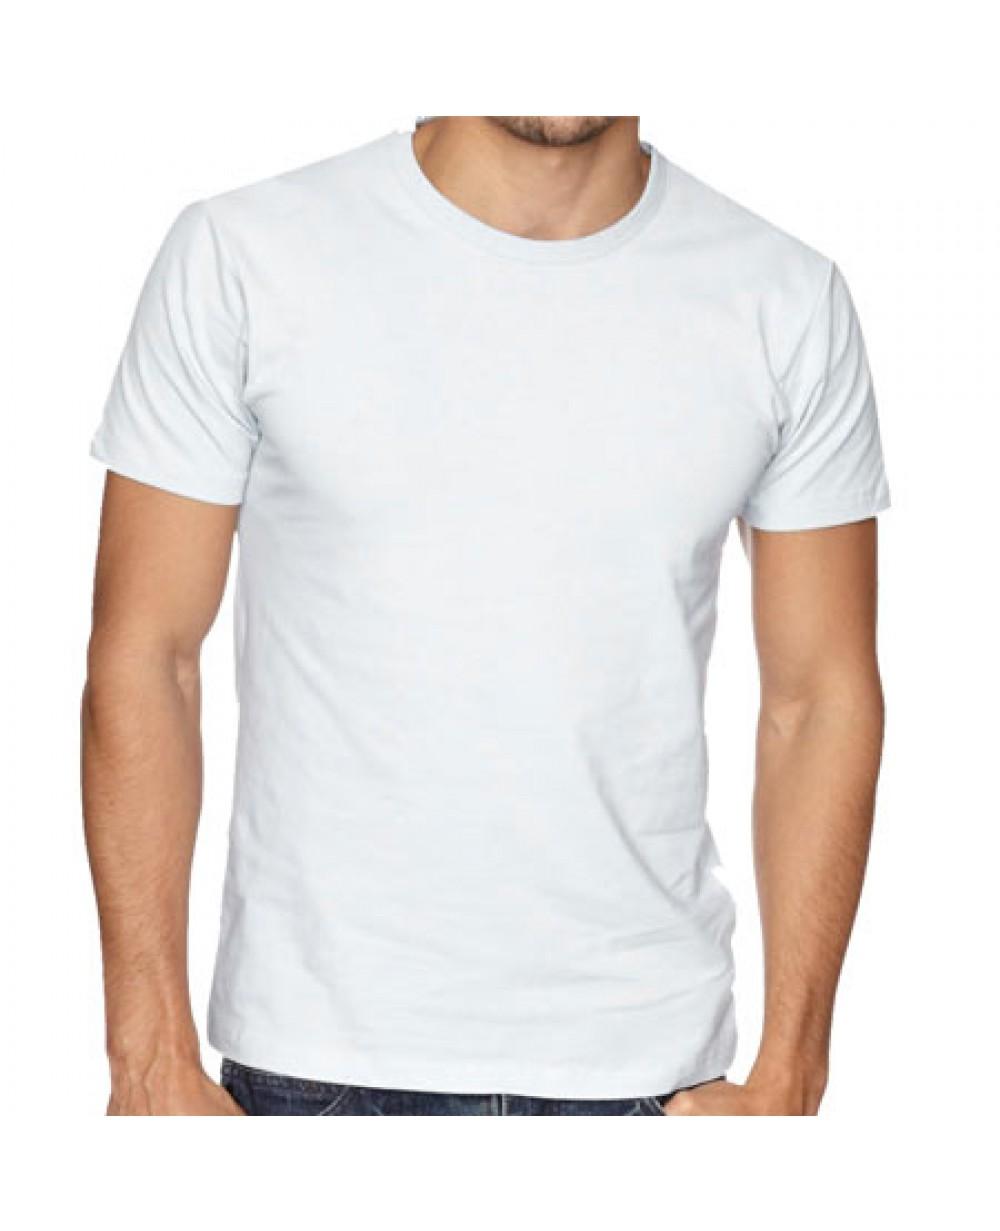 Mens Soft Cotton T Shirts